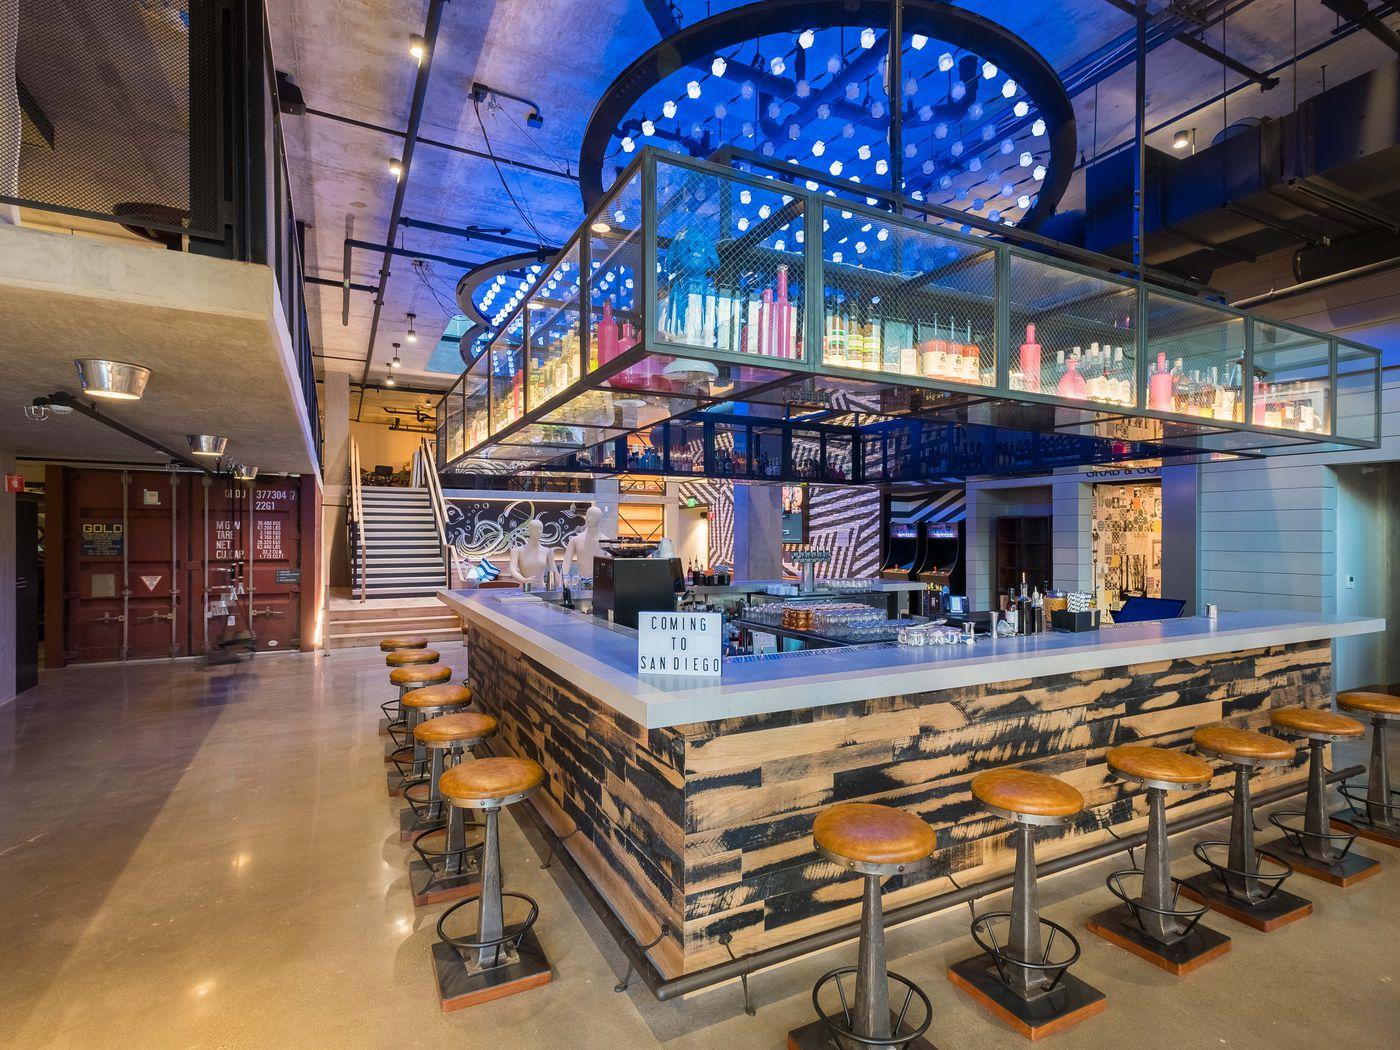 Downtown's Got a Groovy New Hotel Bar - Eater San Diego